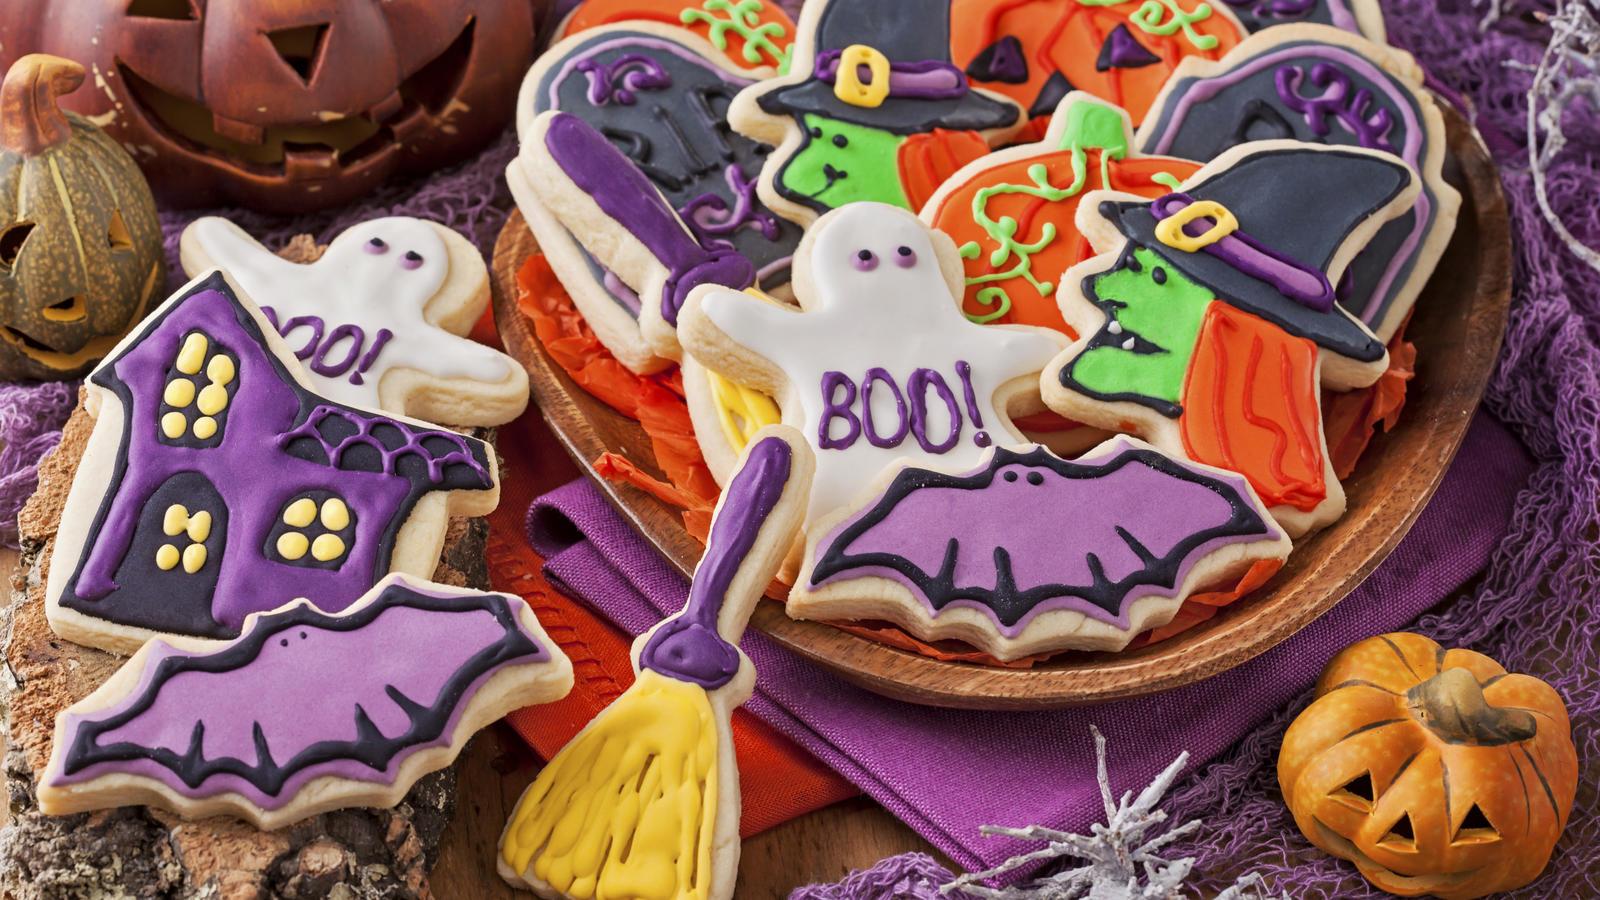 Spooky Halloween Cookies Good Food Channel